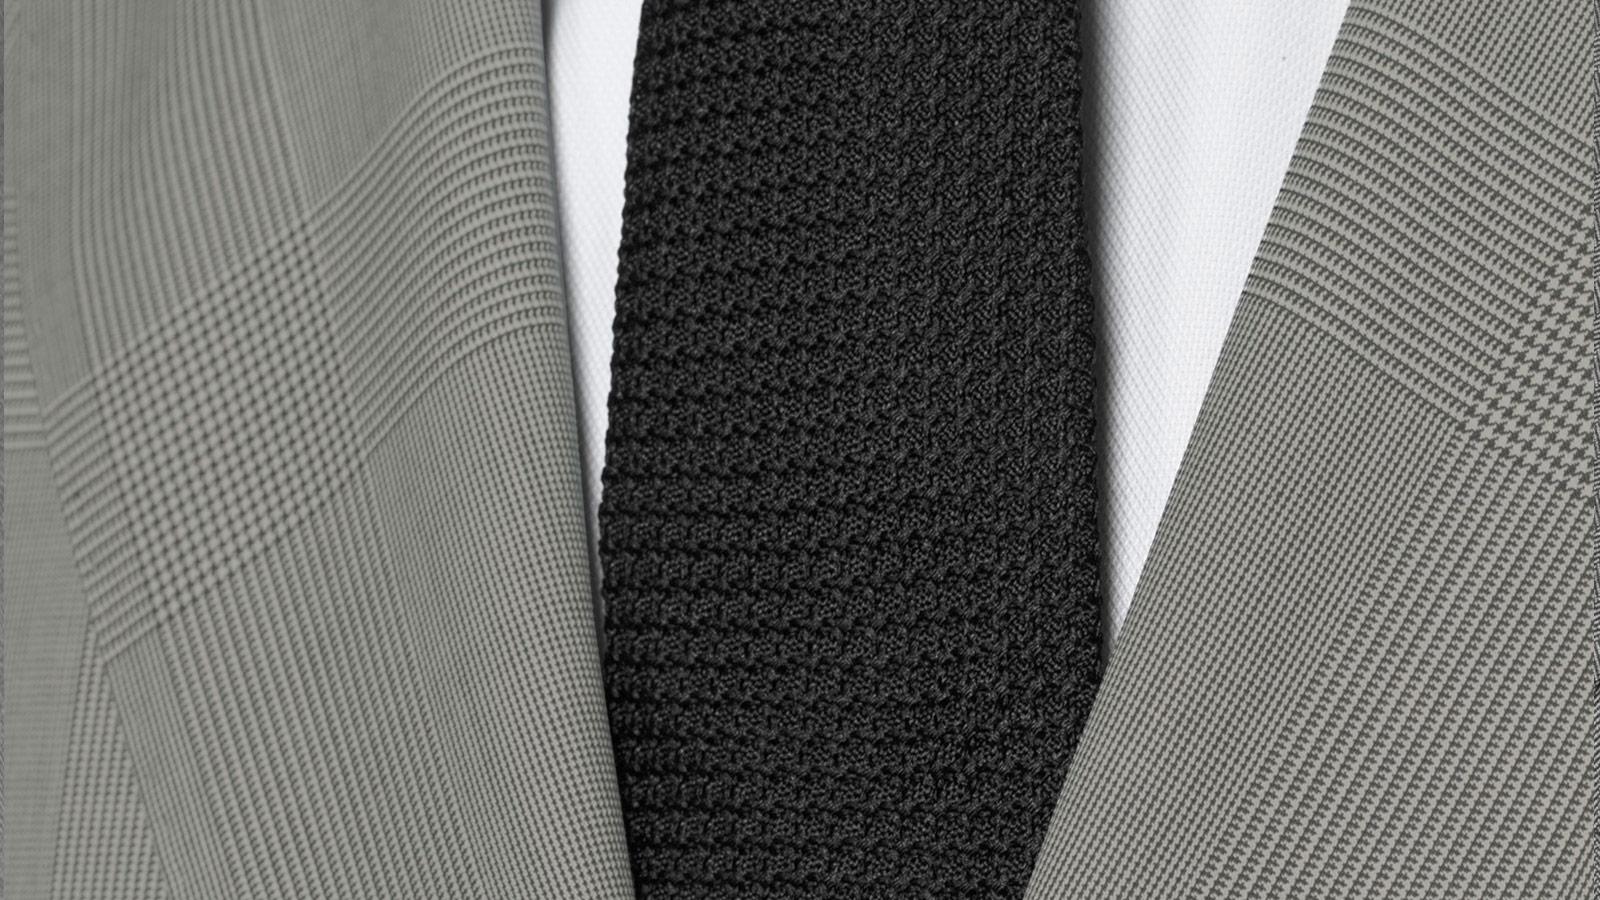 Vendetta Premium Grey Prince of Wales Check Suit - slider image 1